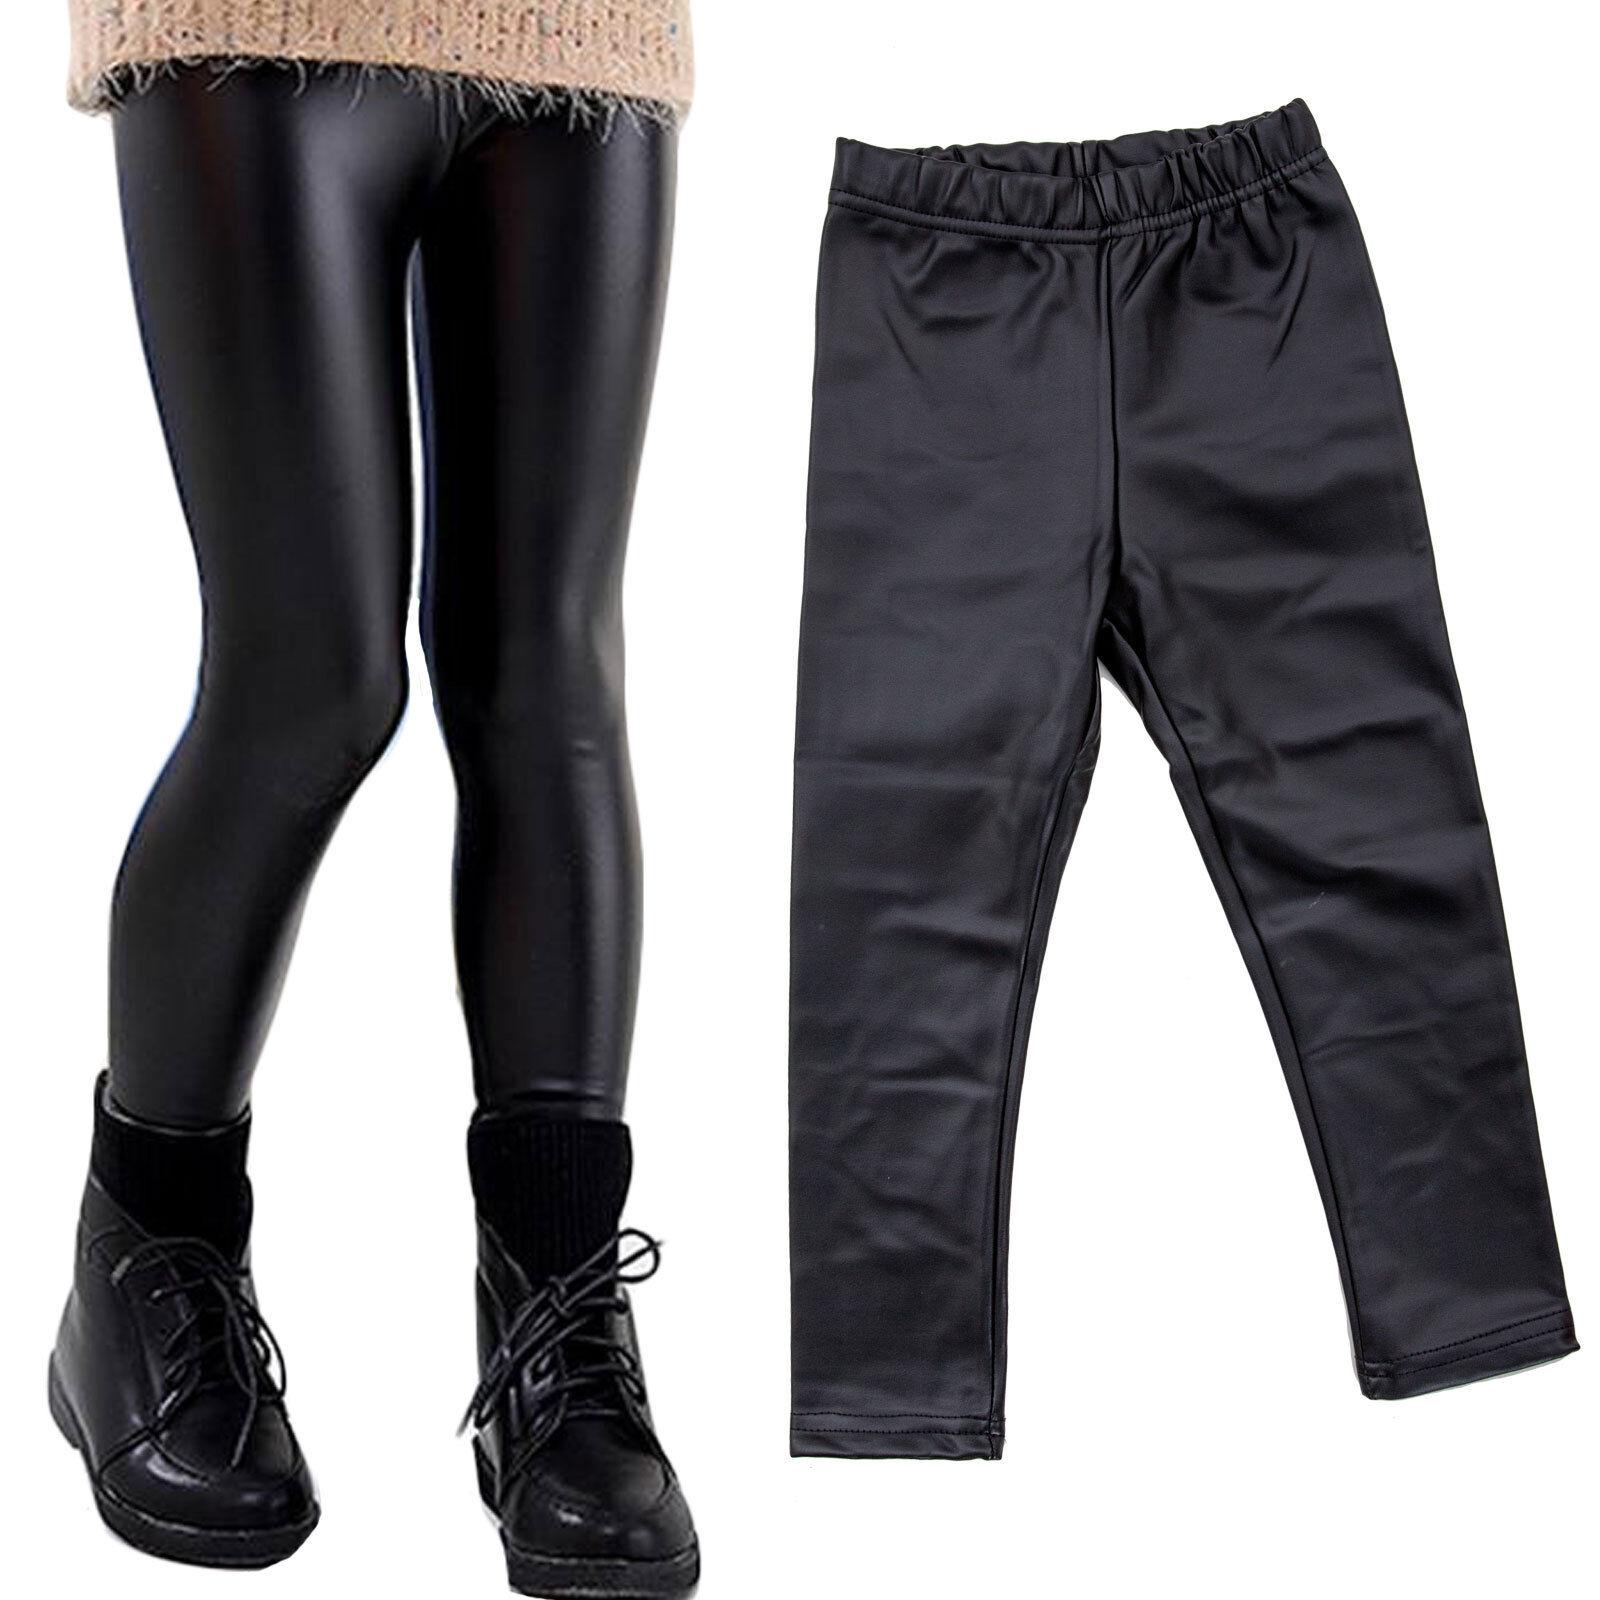 davvero comodo cercare vendita economica Leggings Baby Girl Leather Effect PANTS LIQUID LEGGINGS NEW 816 | eBay